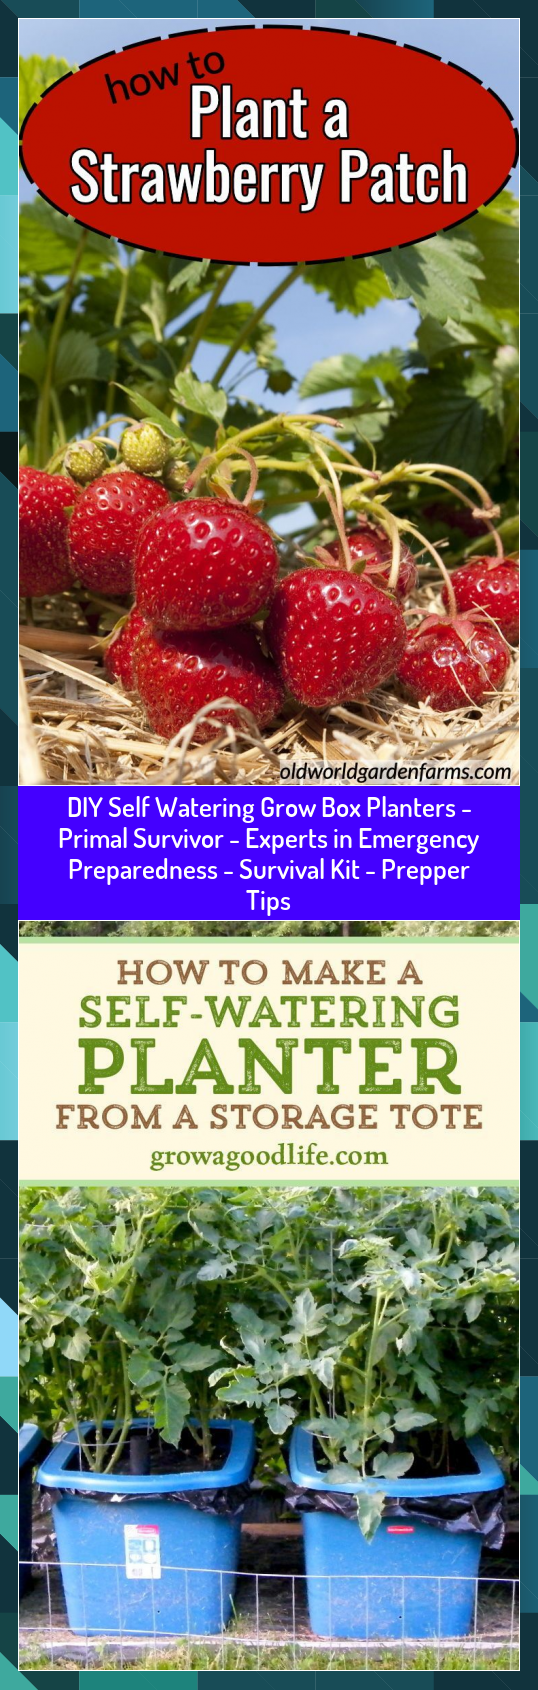 DIY Self Watering Grow Box Planters  Primal Survivor  Experts in Emergency Preparedness  Survival Kit  Prepper Tips